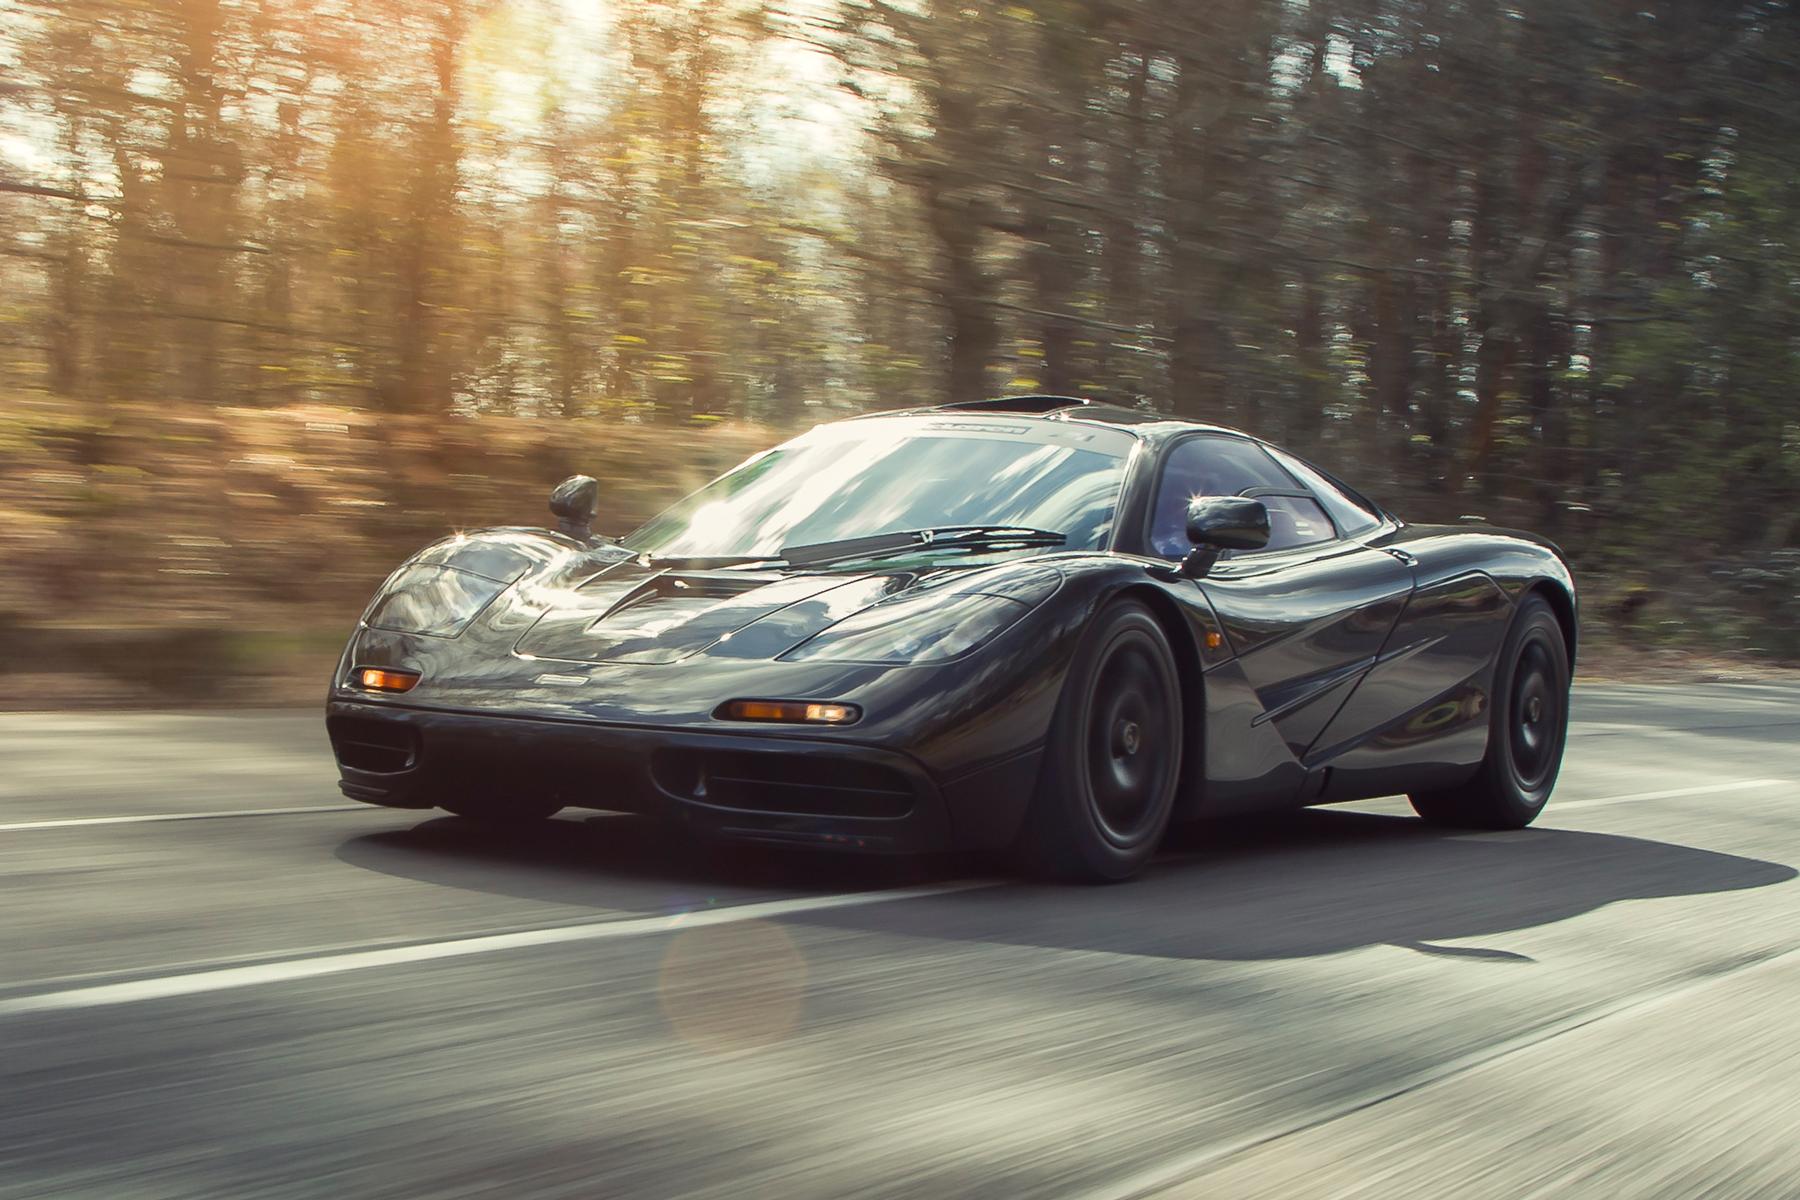 McLaren Just Put an F1 up for Sale